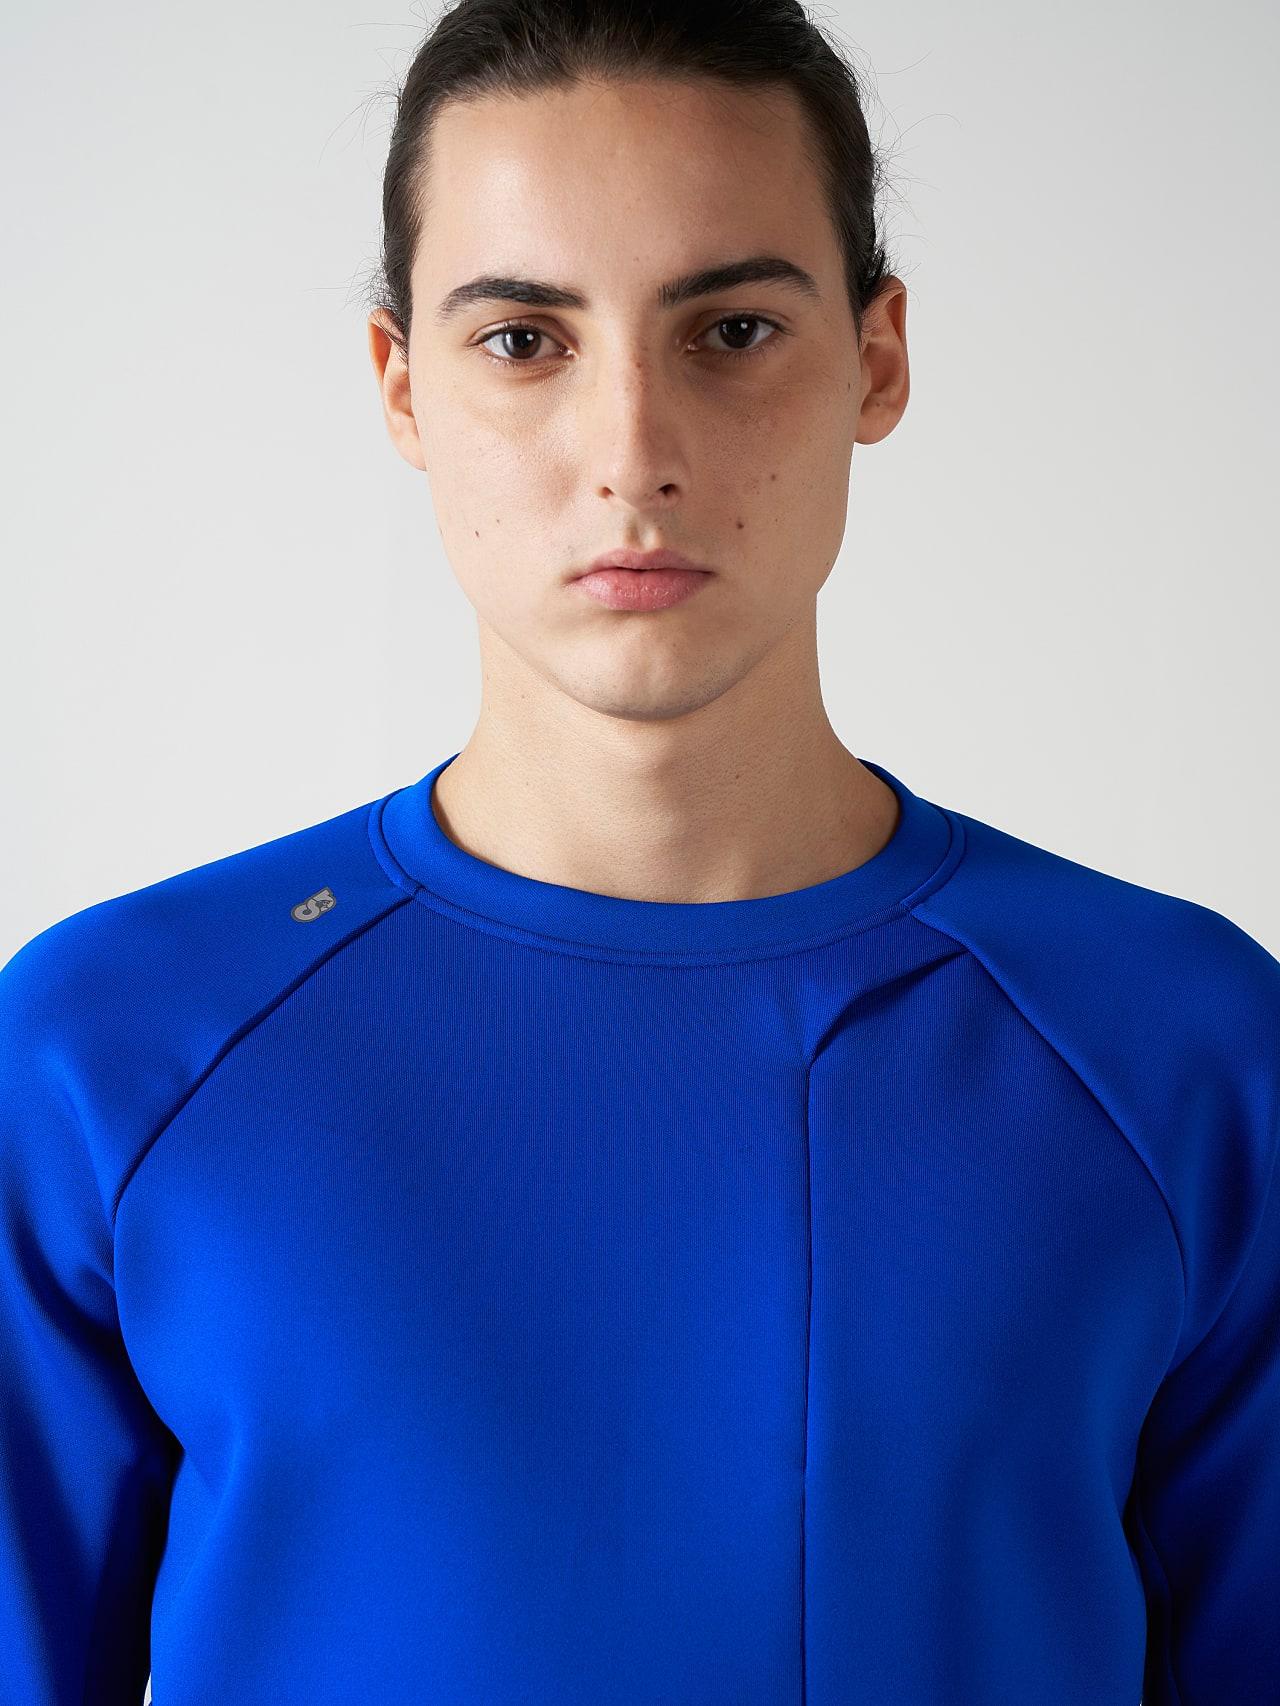 SUPRA V3.Y5.01 Technical Crewneck Sweater blue Right Alpha Tauri